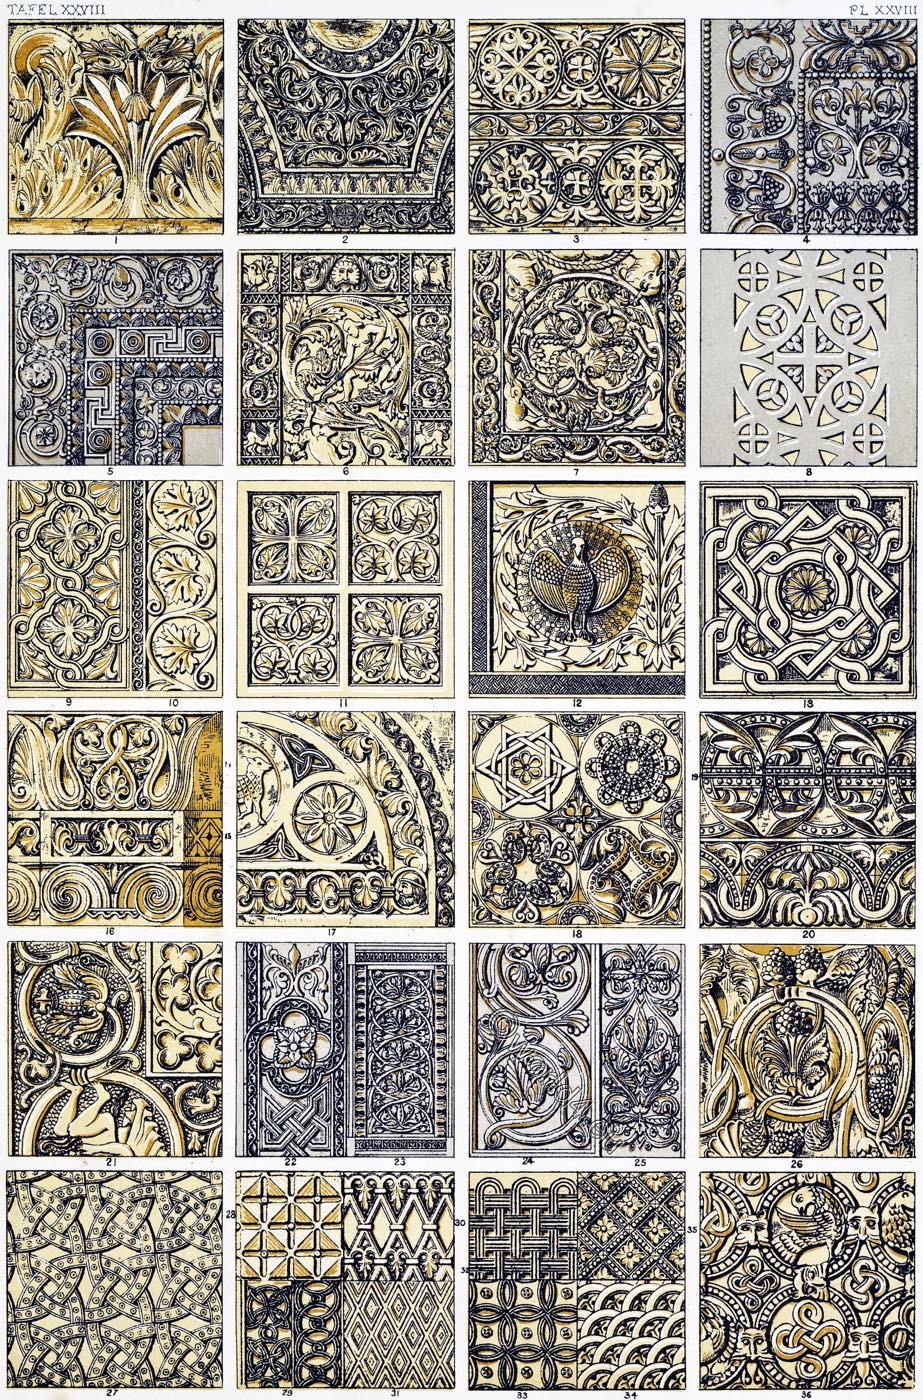 Owen Jones, Byzantine, ornament, Sofia, Constantinople, Friezes, Monreale